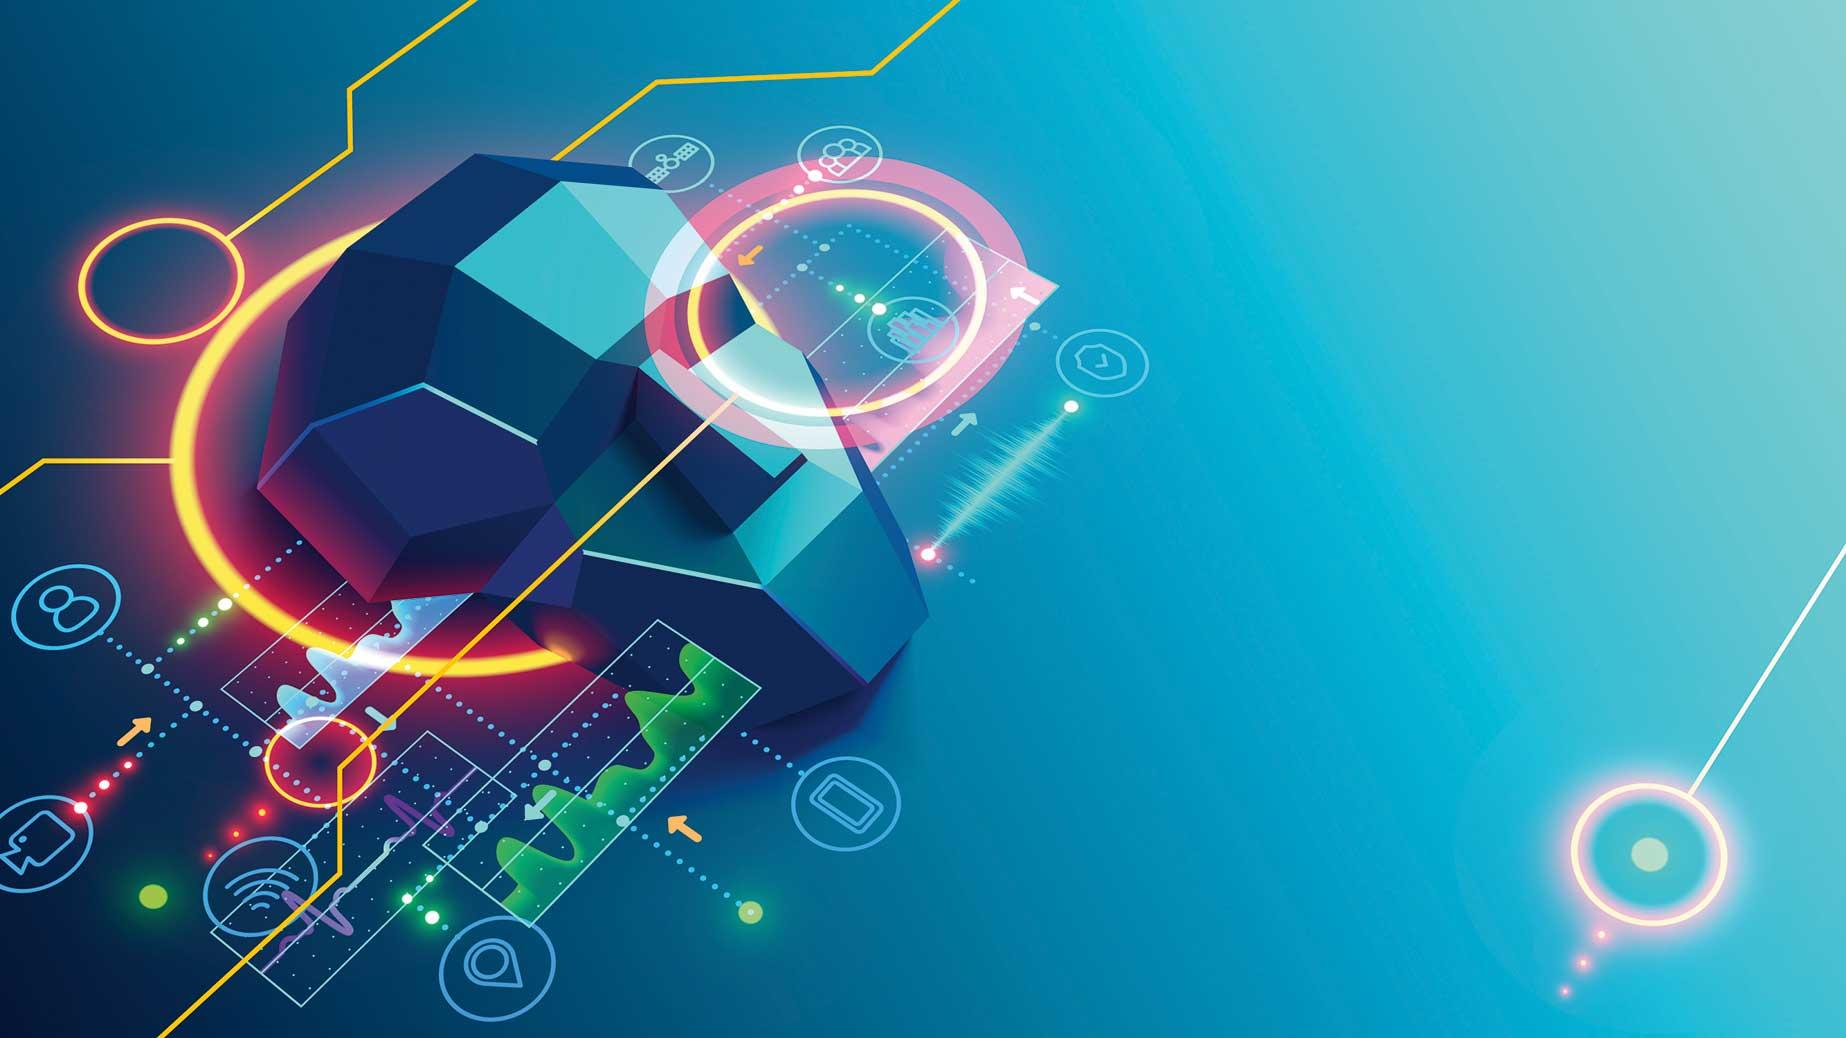 SuryaRamkumar: De toekomst van AI begint nu